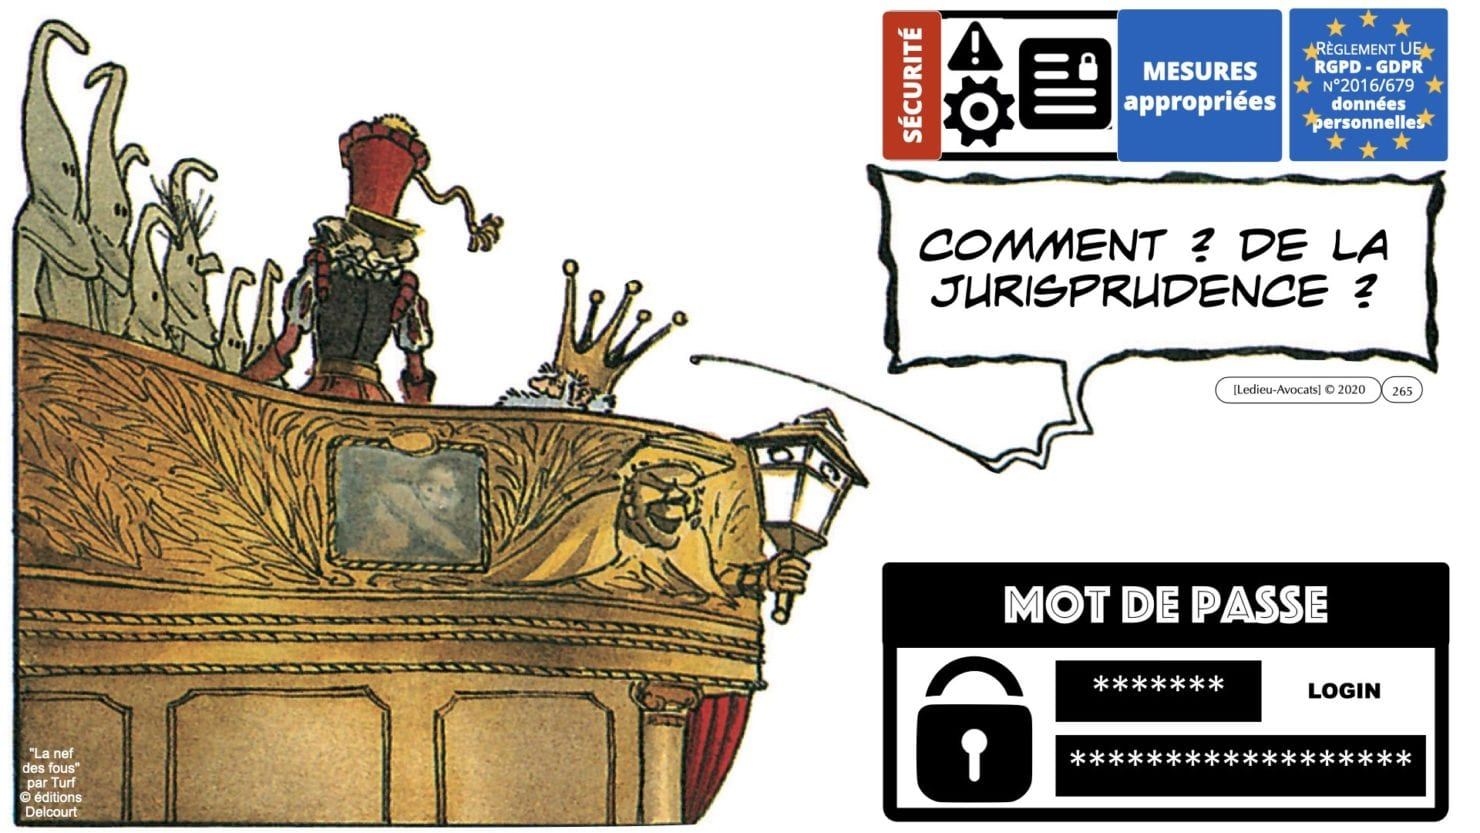 RGPD e-Privacy principes actualité jurisprudence ©Ledieu-Avocats 25-06-2021.265